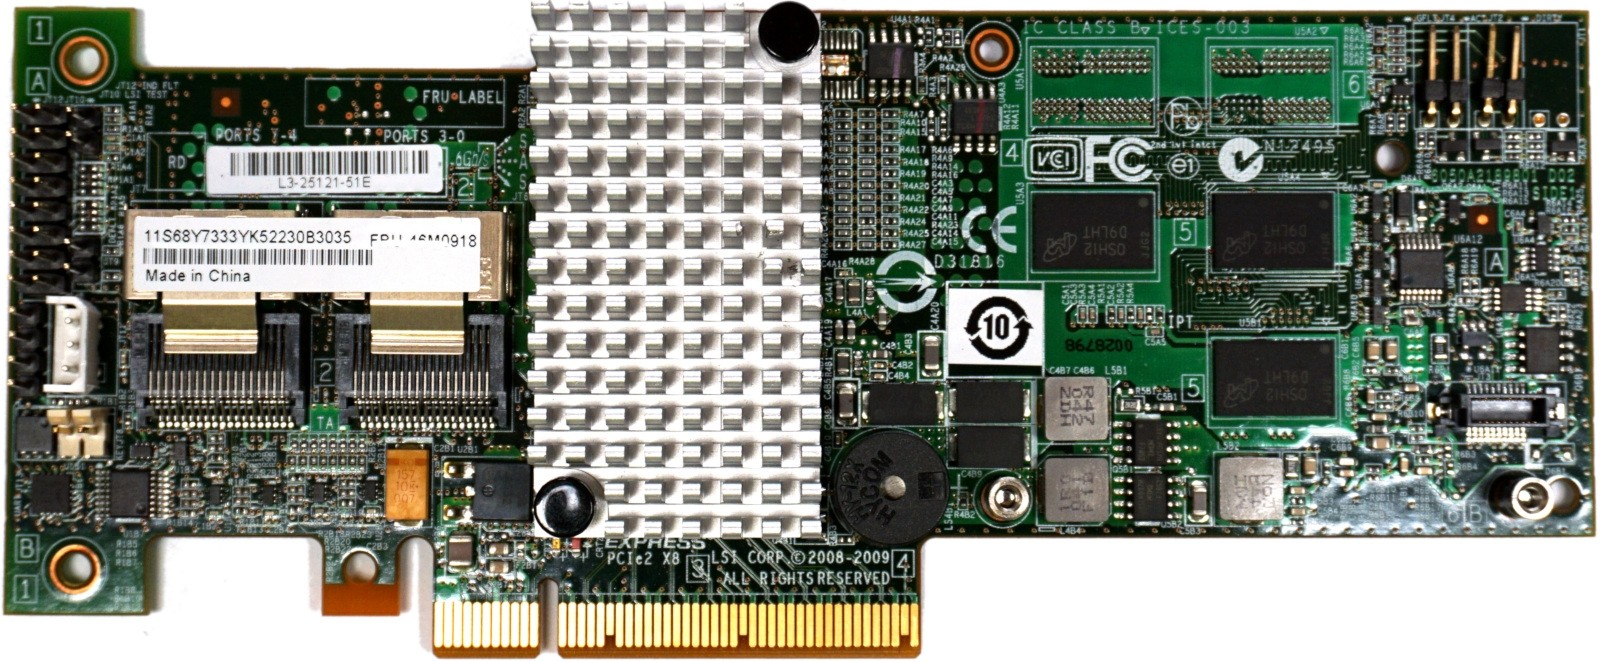 IBM X3650 RAID CONTROLLER WINDOWS VISTA DRIVER DOWNLOAD